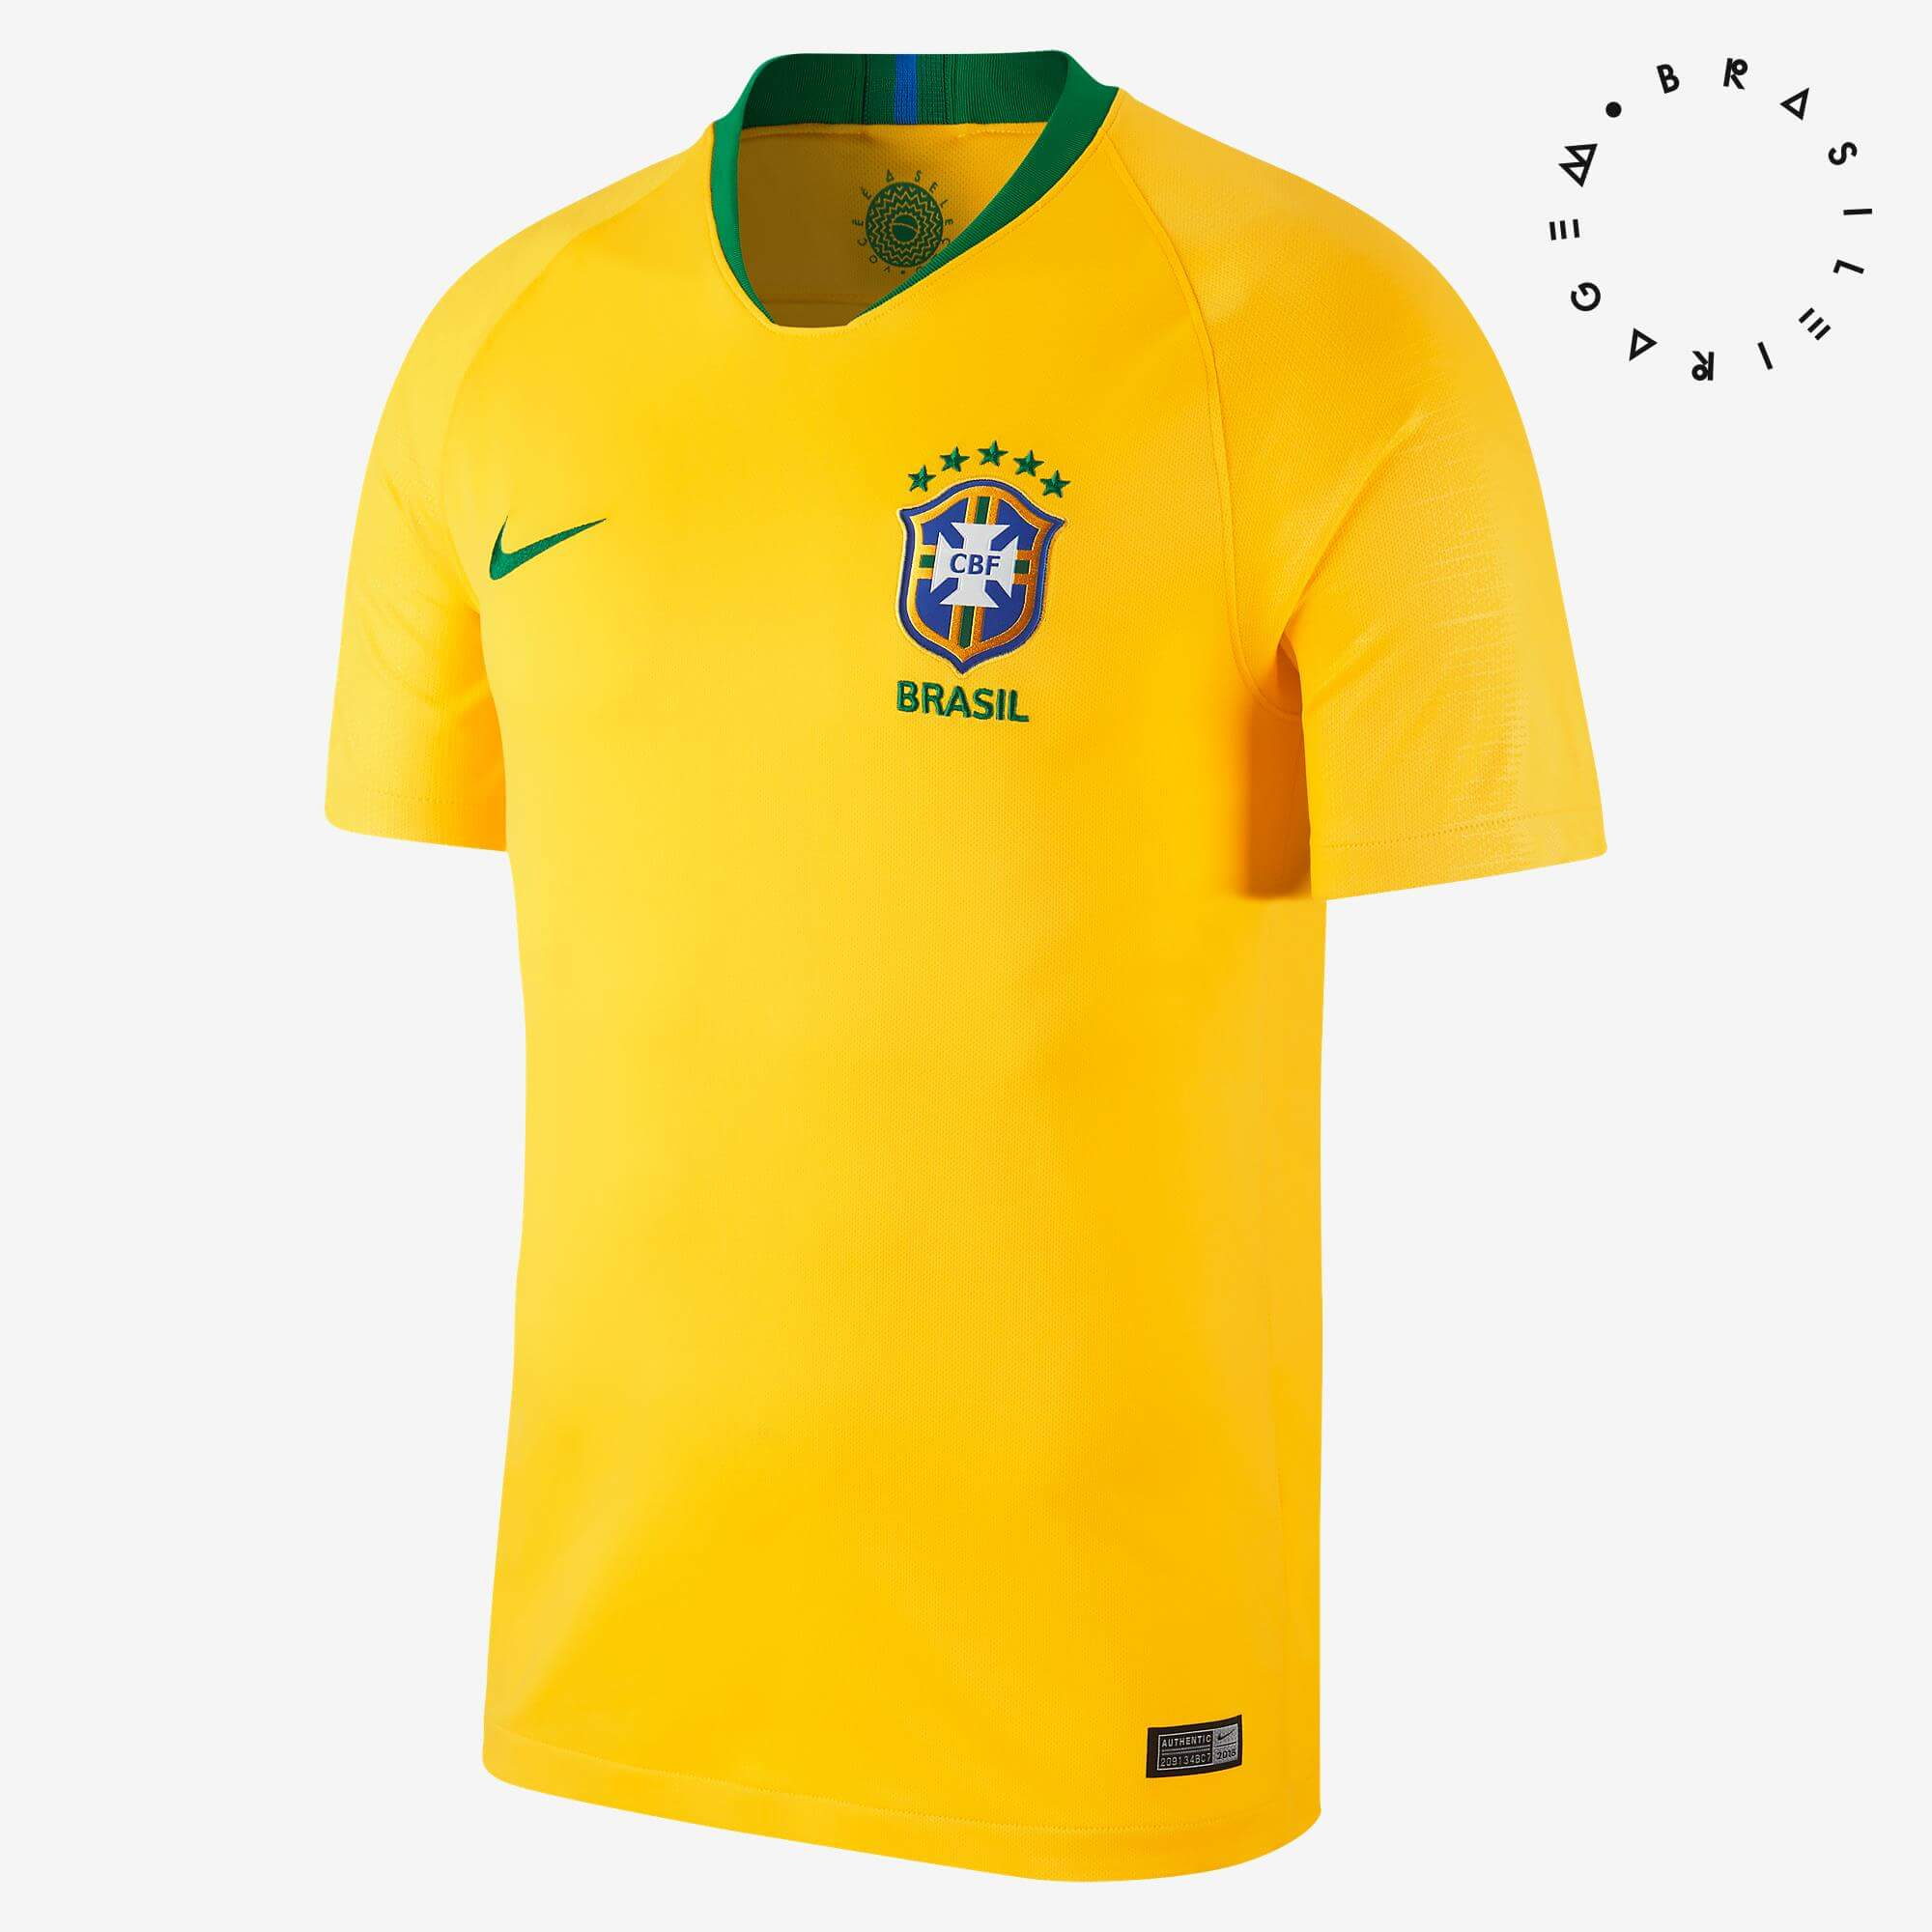 d1c5b0cbe6 Camisa Seleção Brasileira Nike Cbf Brt Stad Jsy - BRACIA SHOP  Loja ...